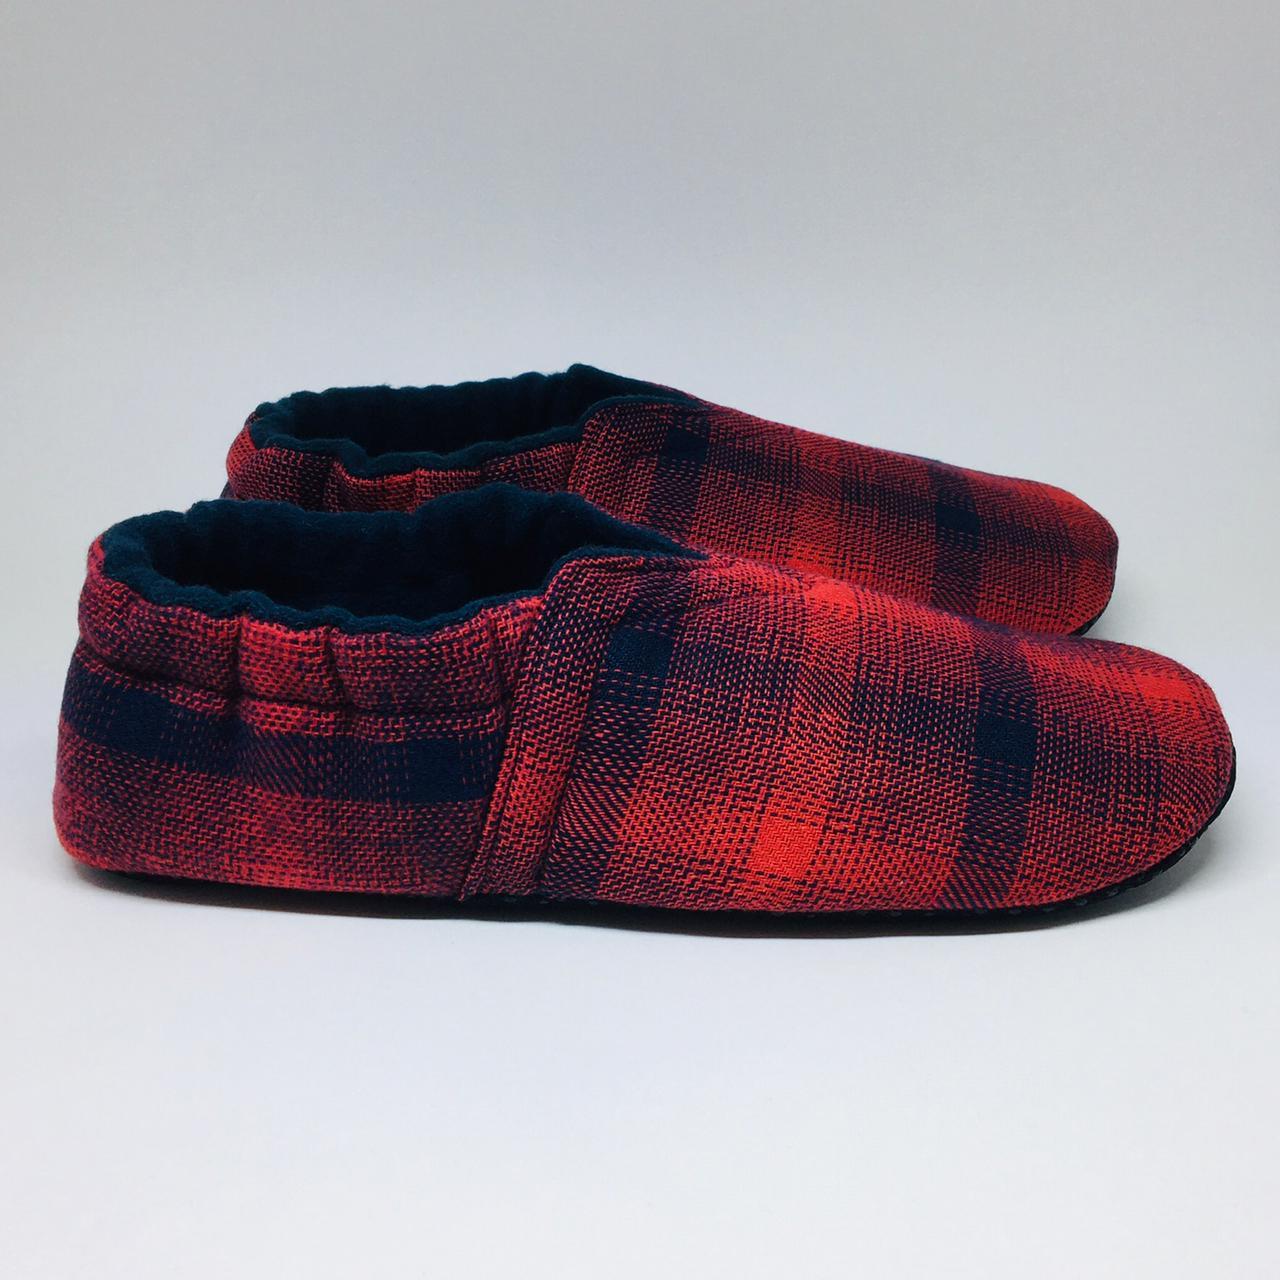 Pantufa de Flanela Xadrez Vermelha e Azul - do RN ao 44